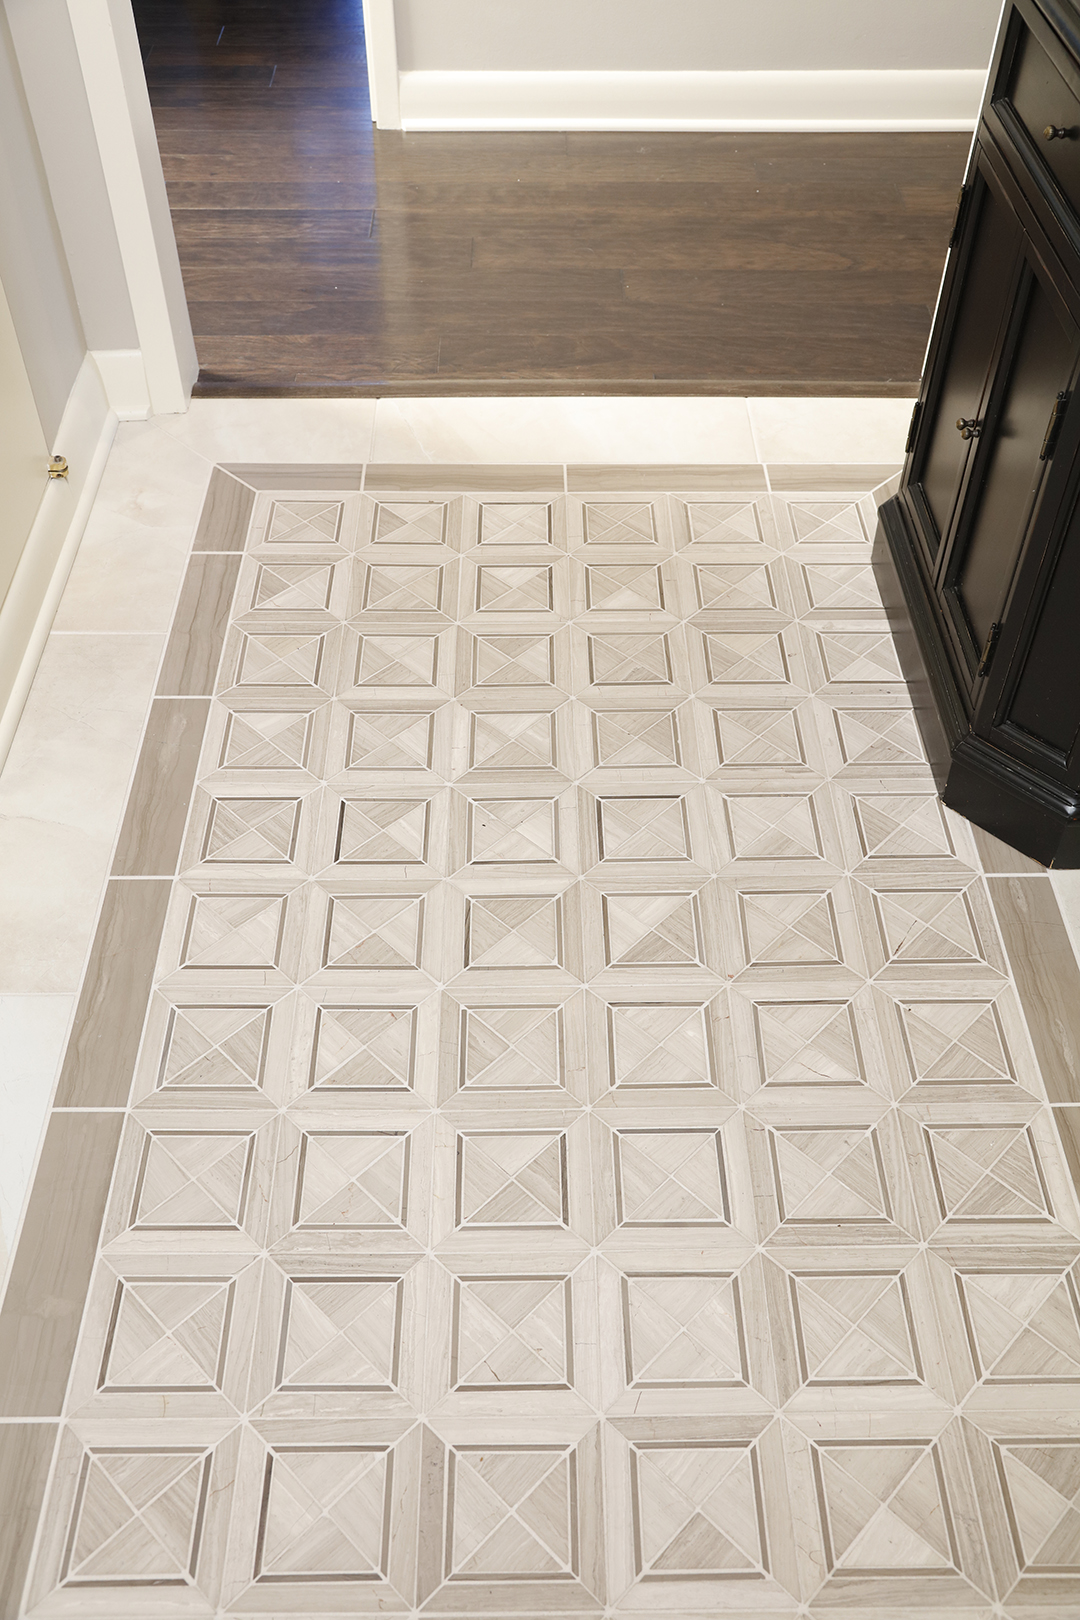 Decorative floor tile inlay